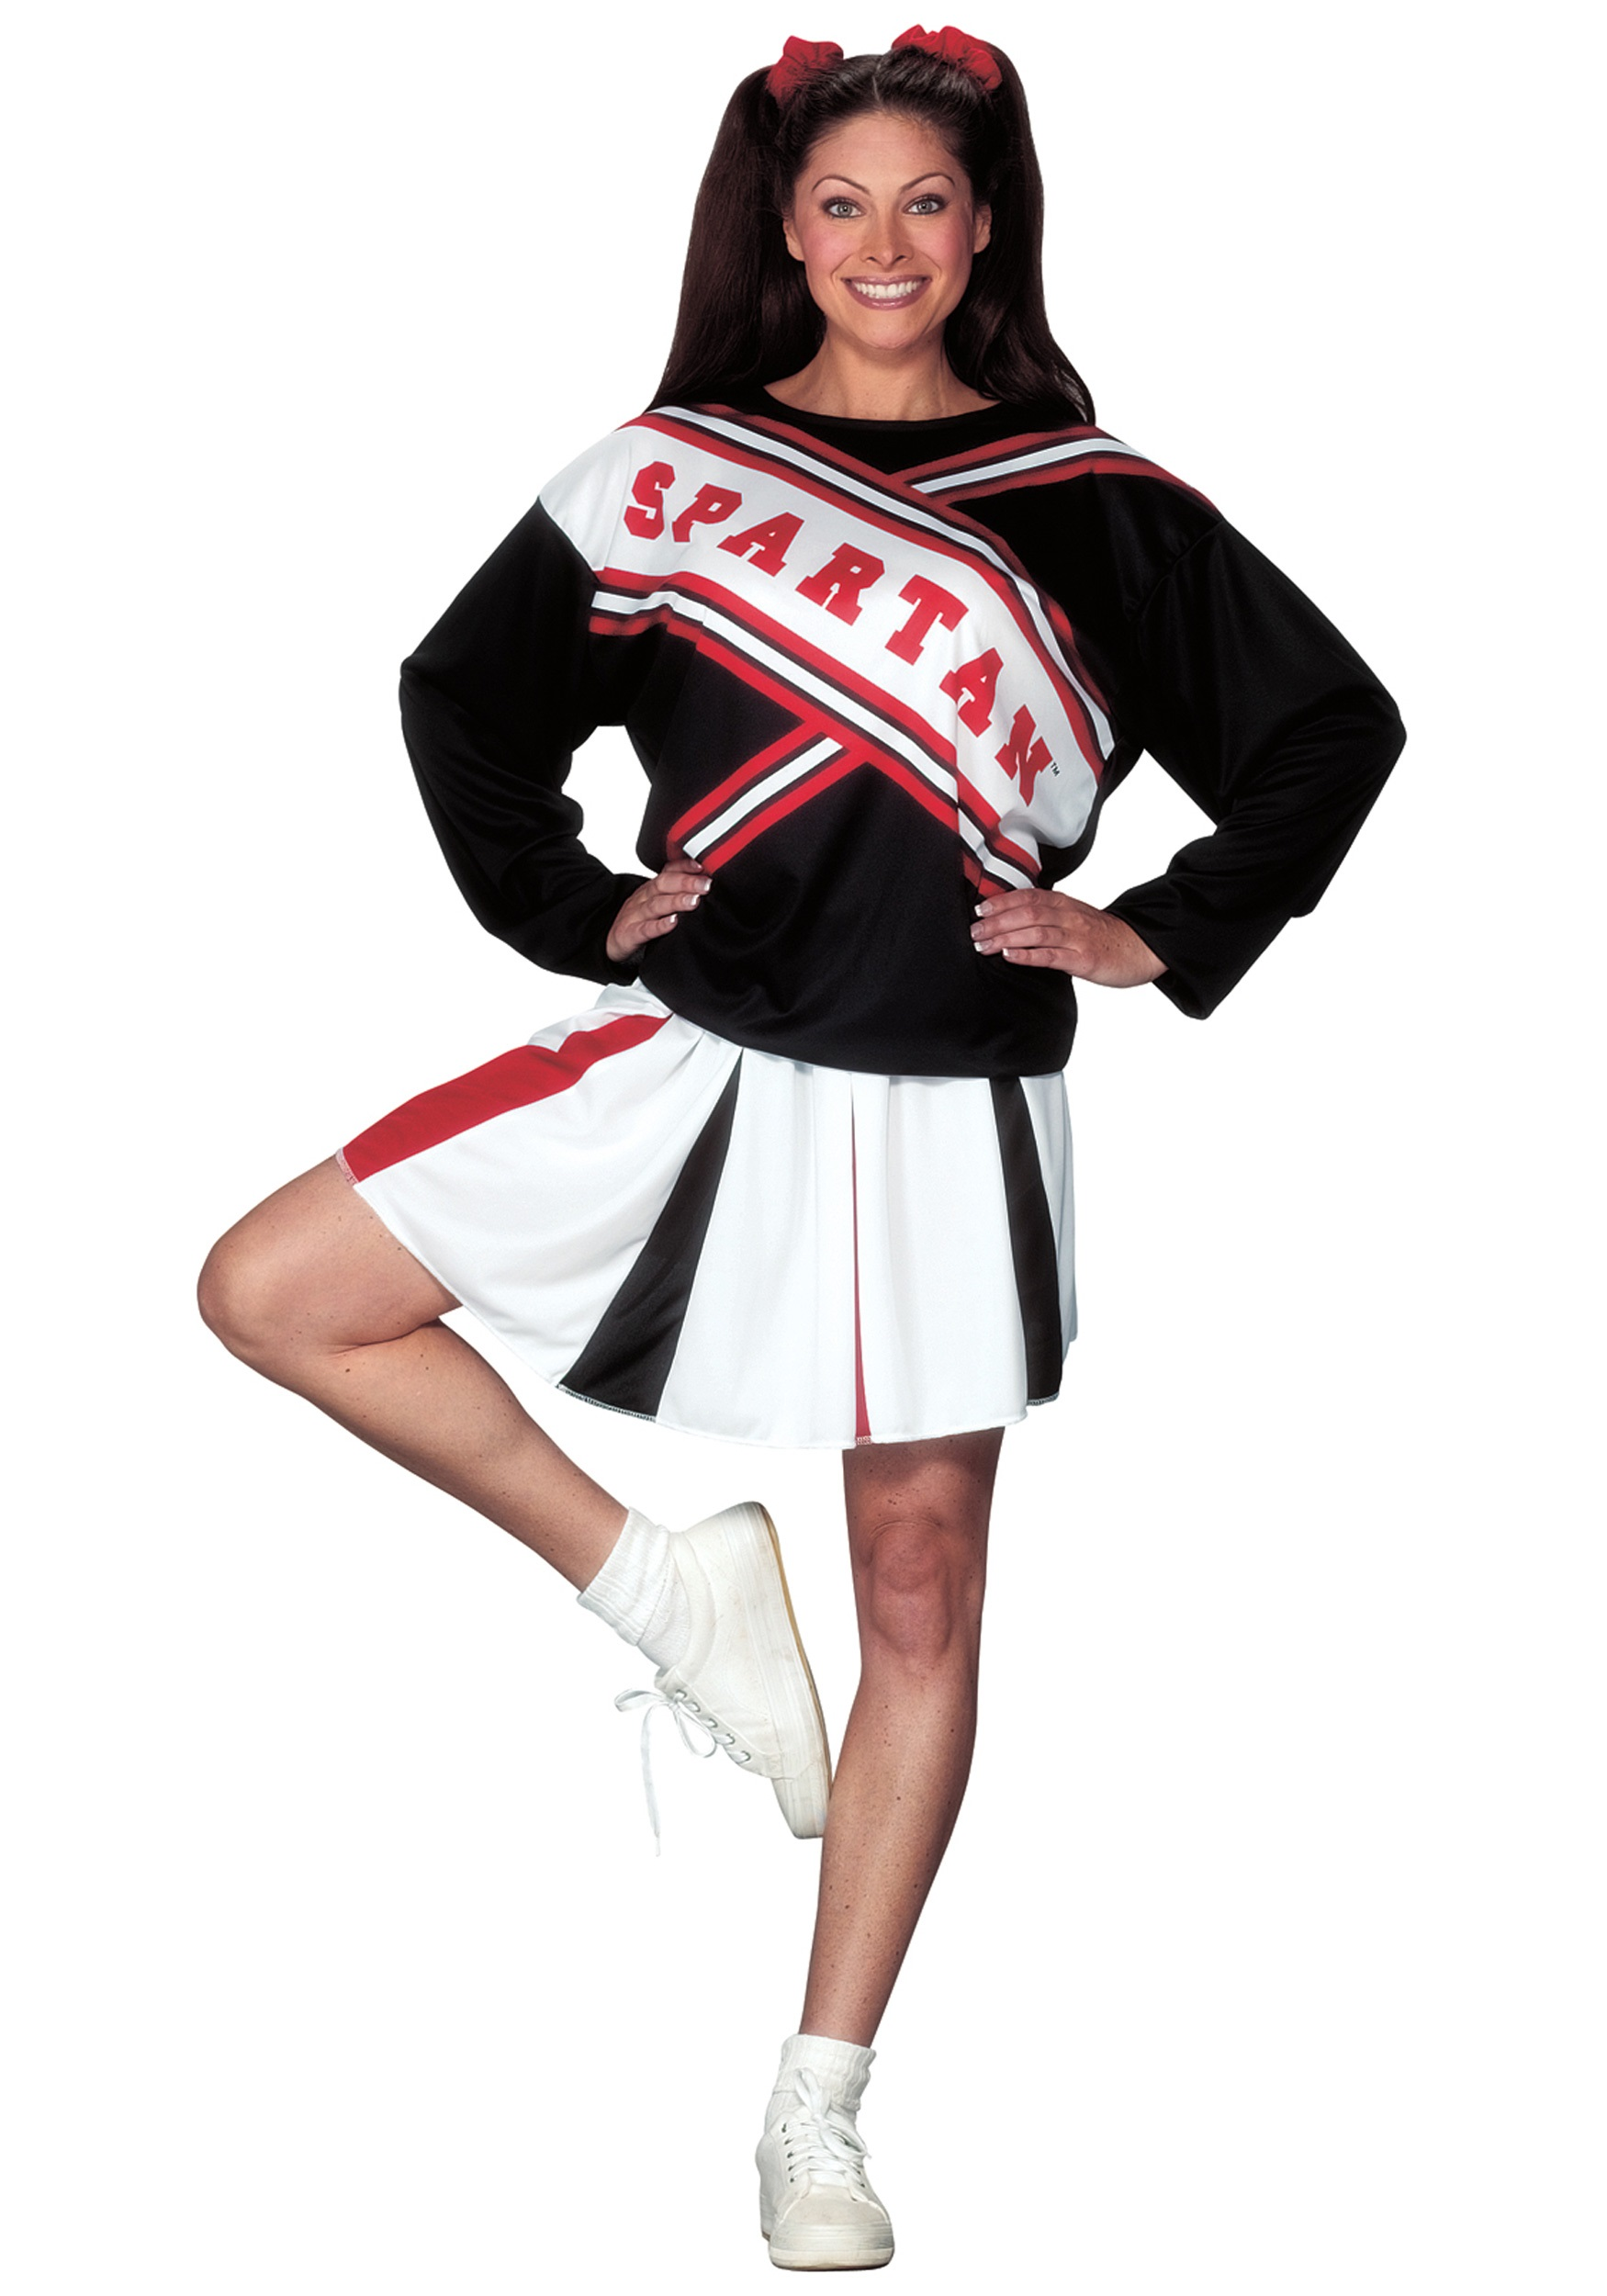 07deb6e0677 Women s Spartan Cheerleader Costume